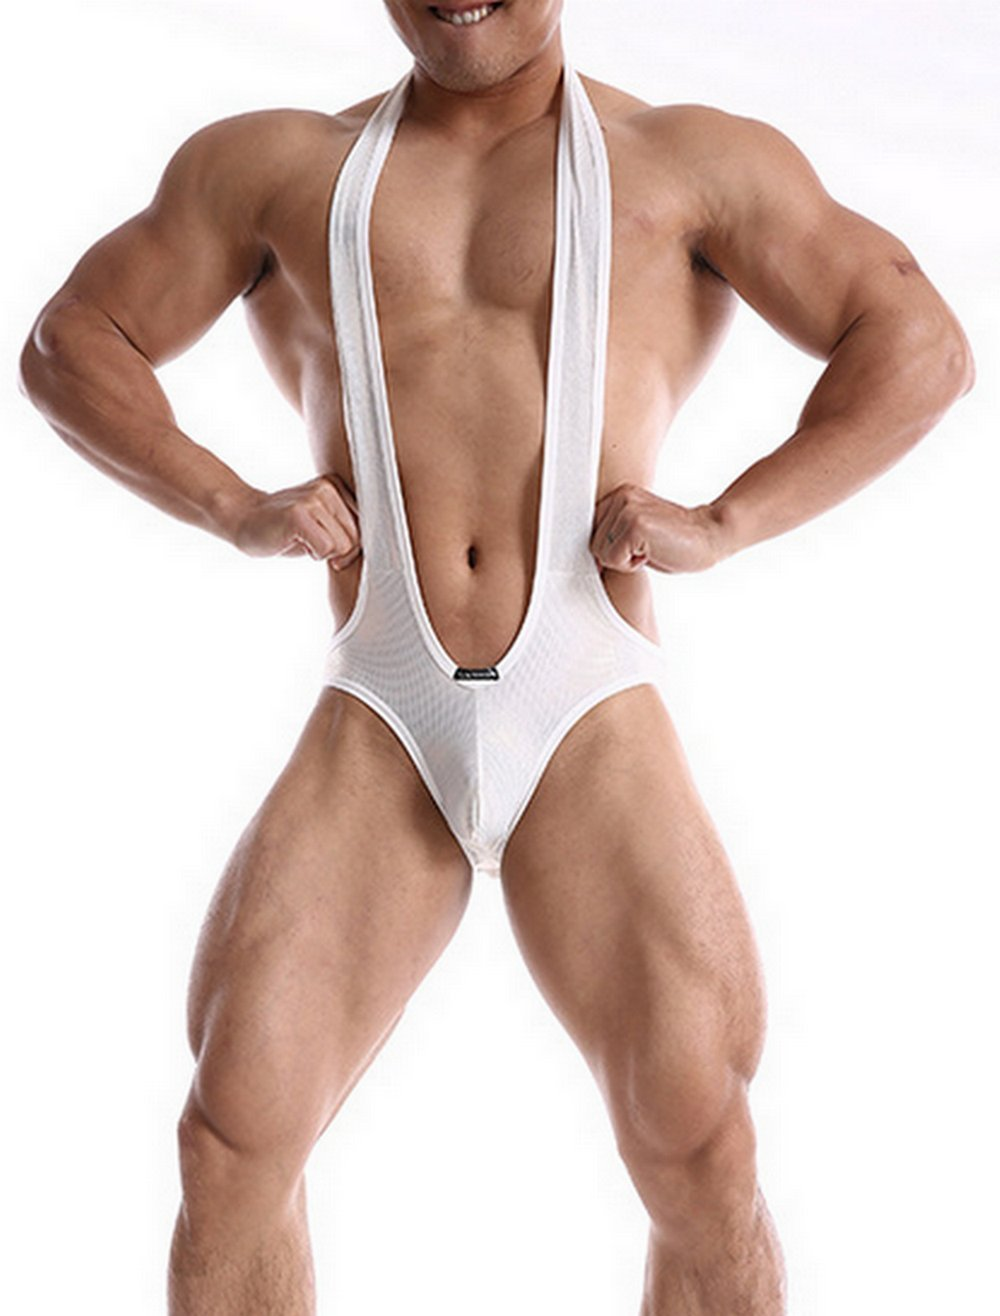 TAIPOVE Men Open Butt Sexy Lingerie Underwear Stretch Briefs Erotic Bodysuits Wrestling Singlets Bulge Panty